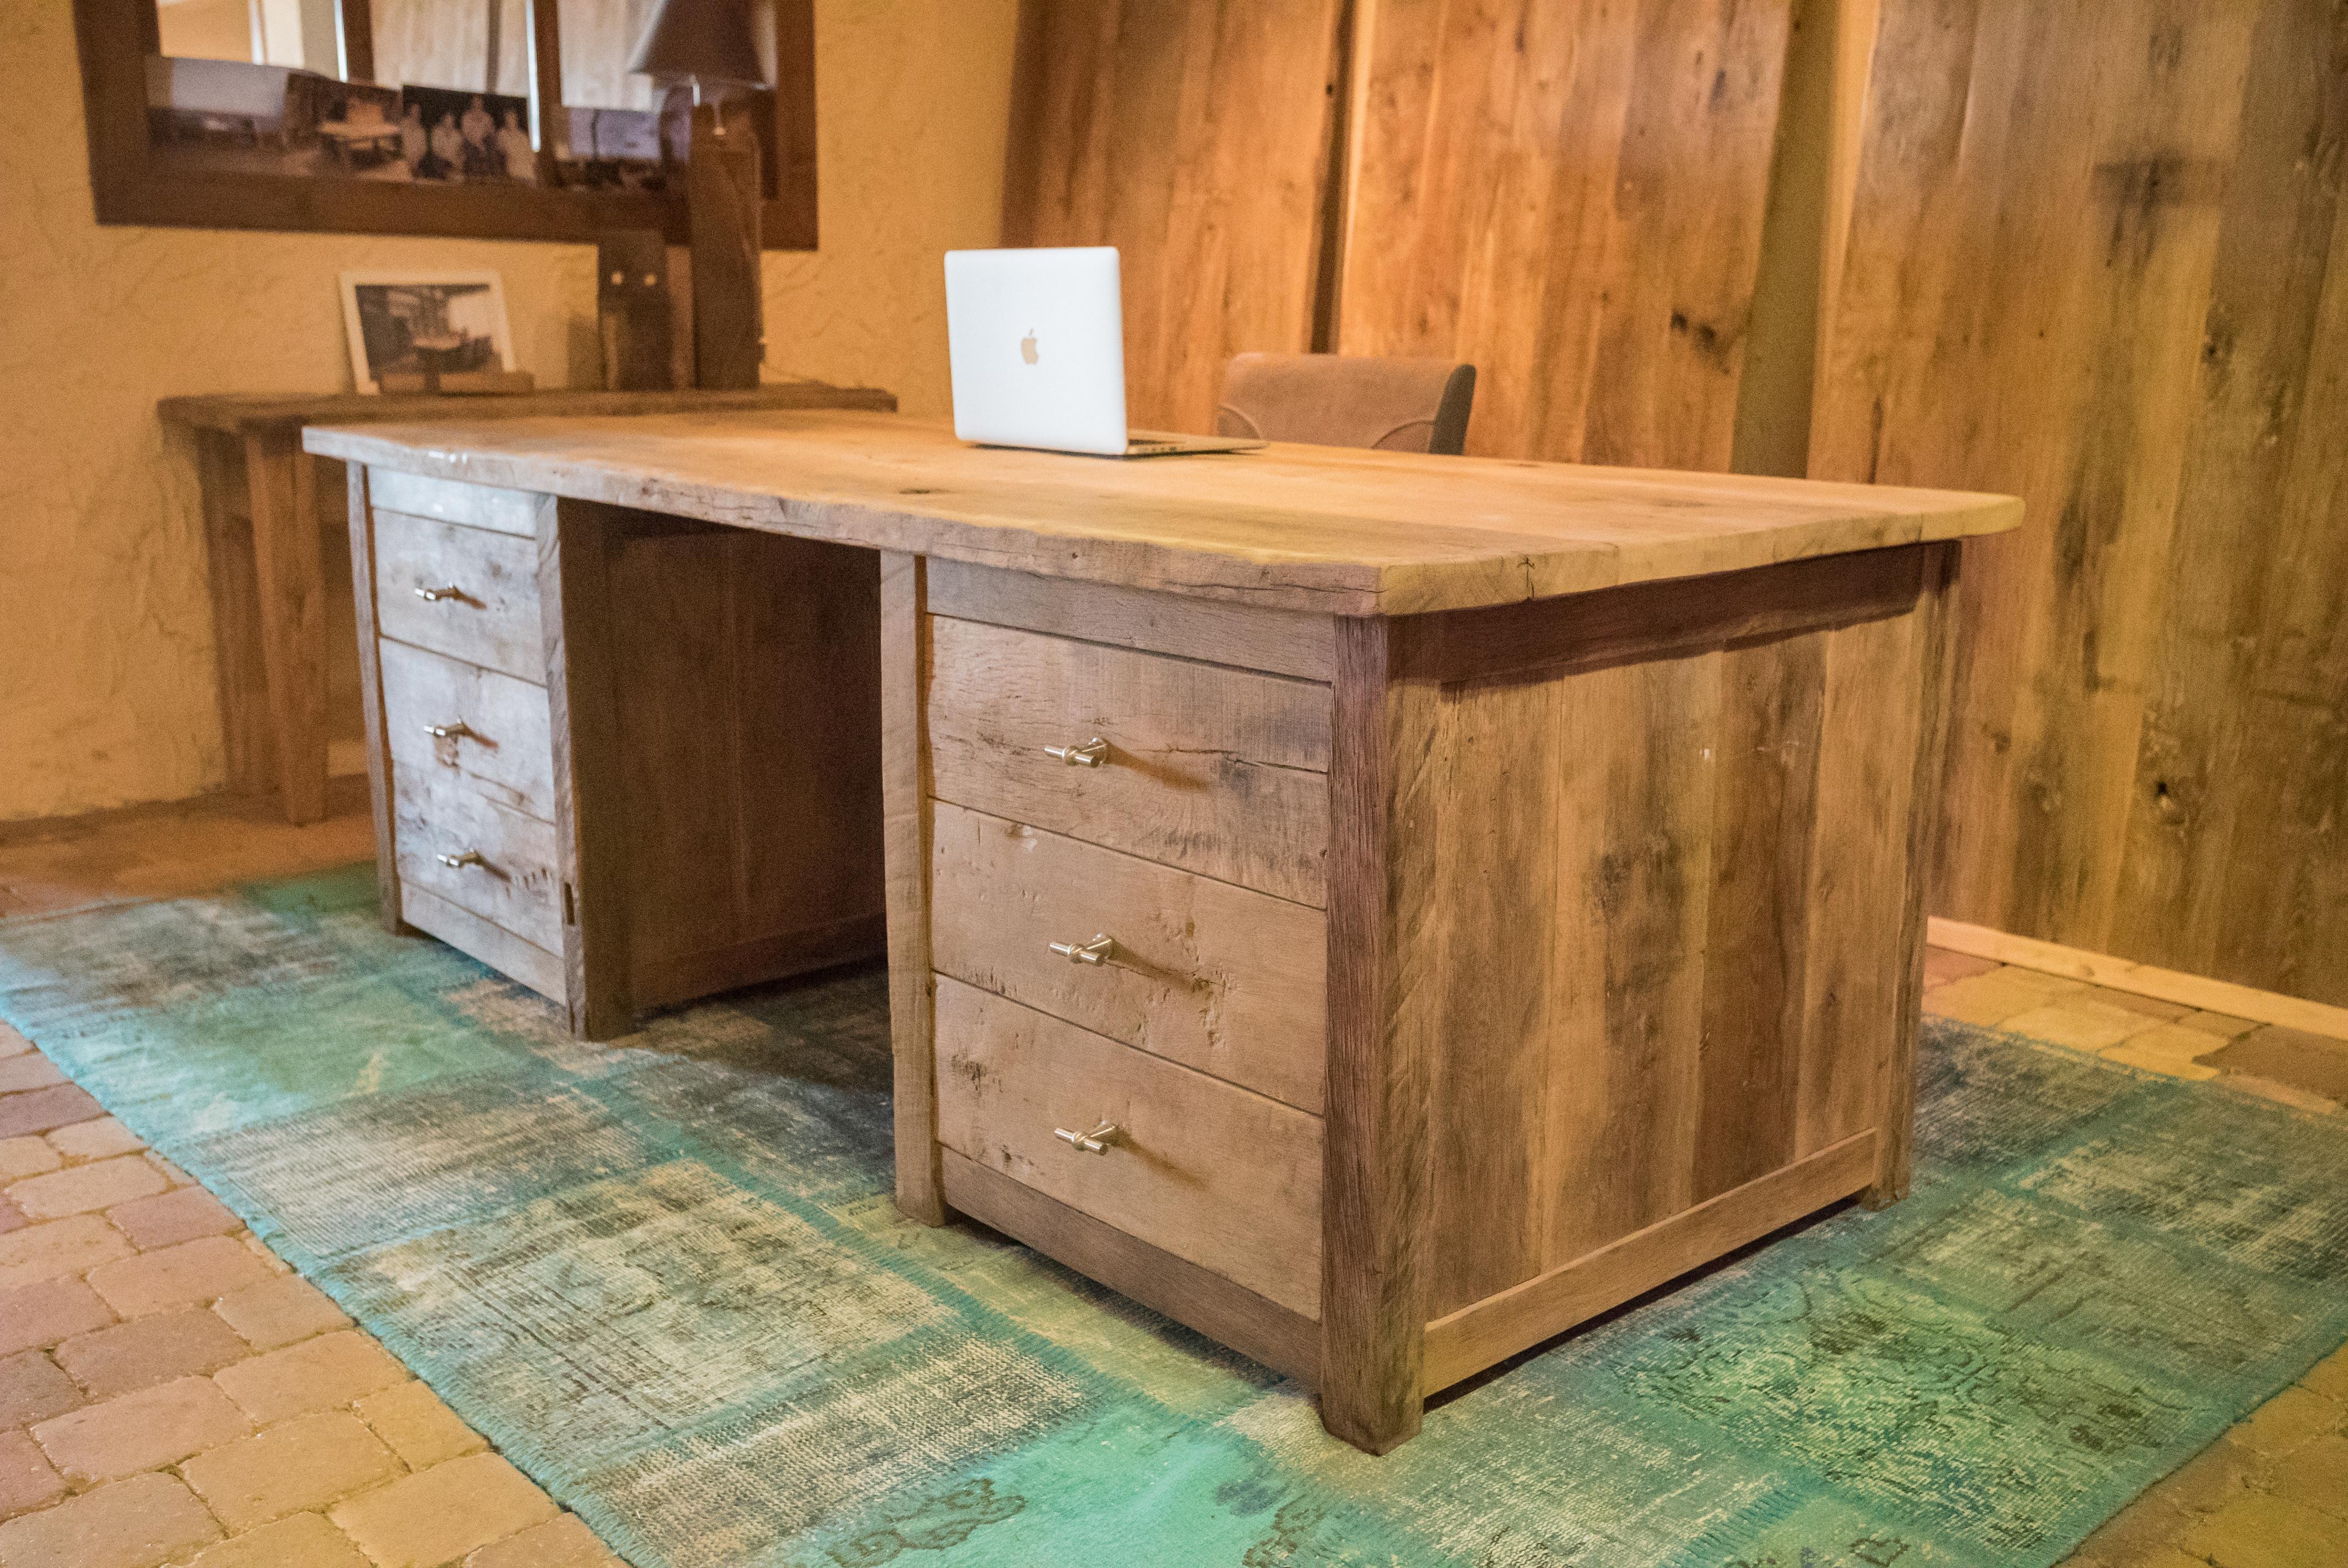 Oud eiken bureau met kleed